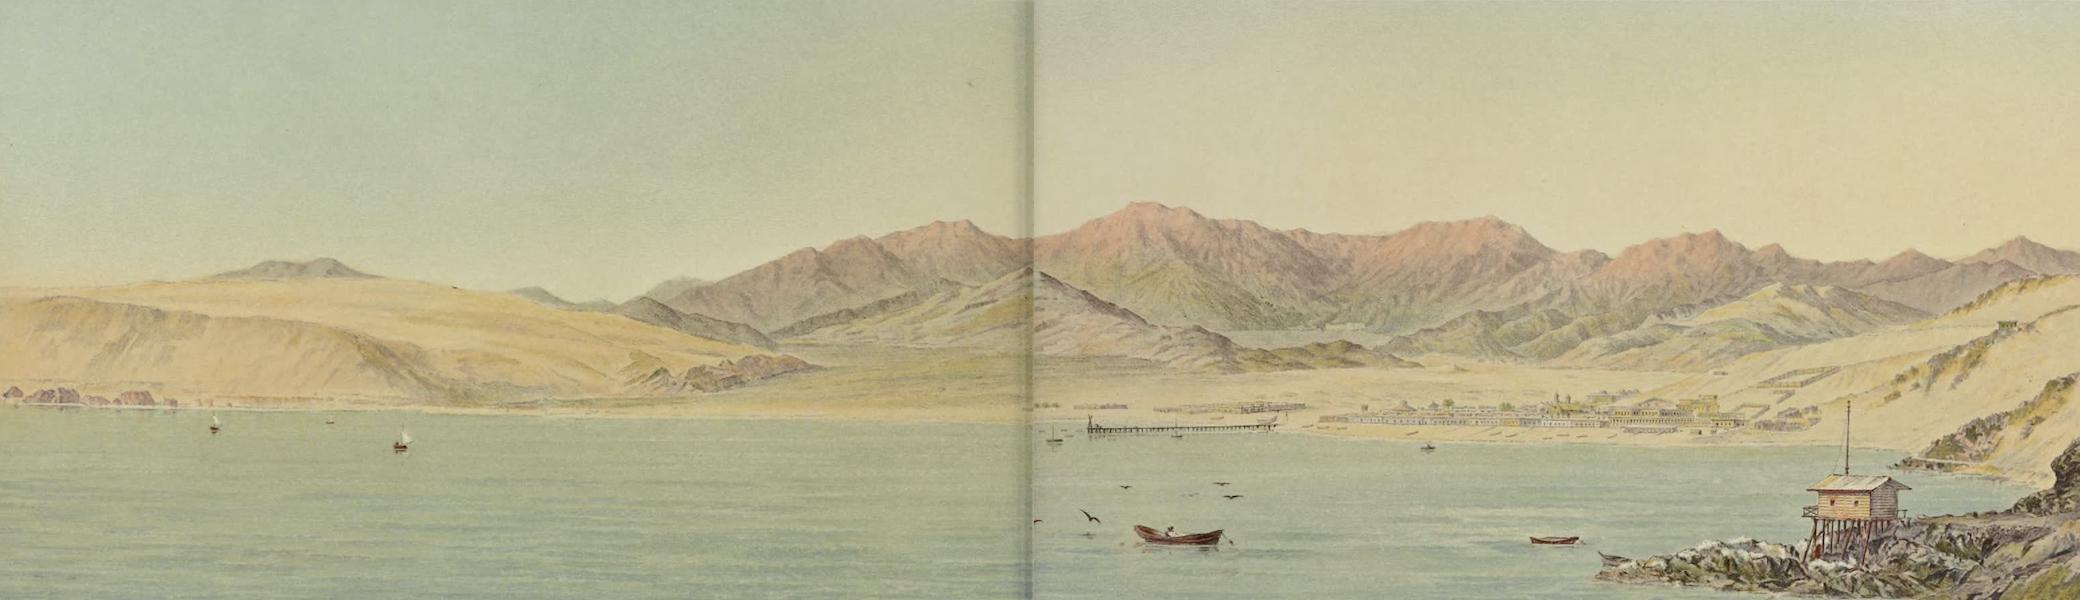 The Necropolis of Ancon Vol. 1 - The Bay of Ancon (1880)